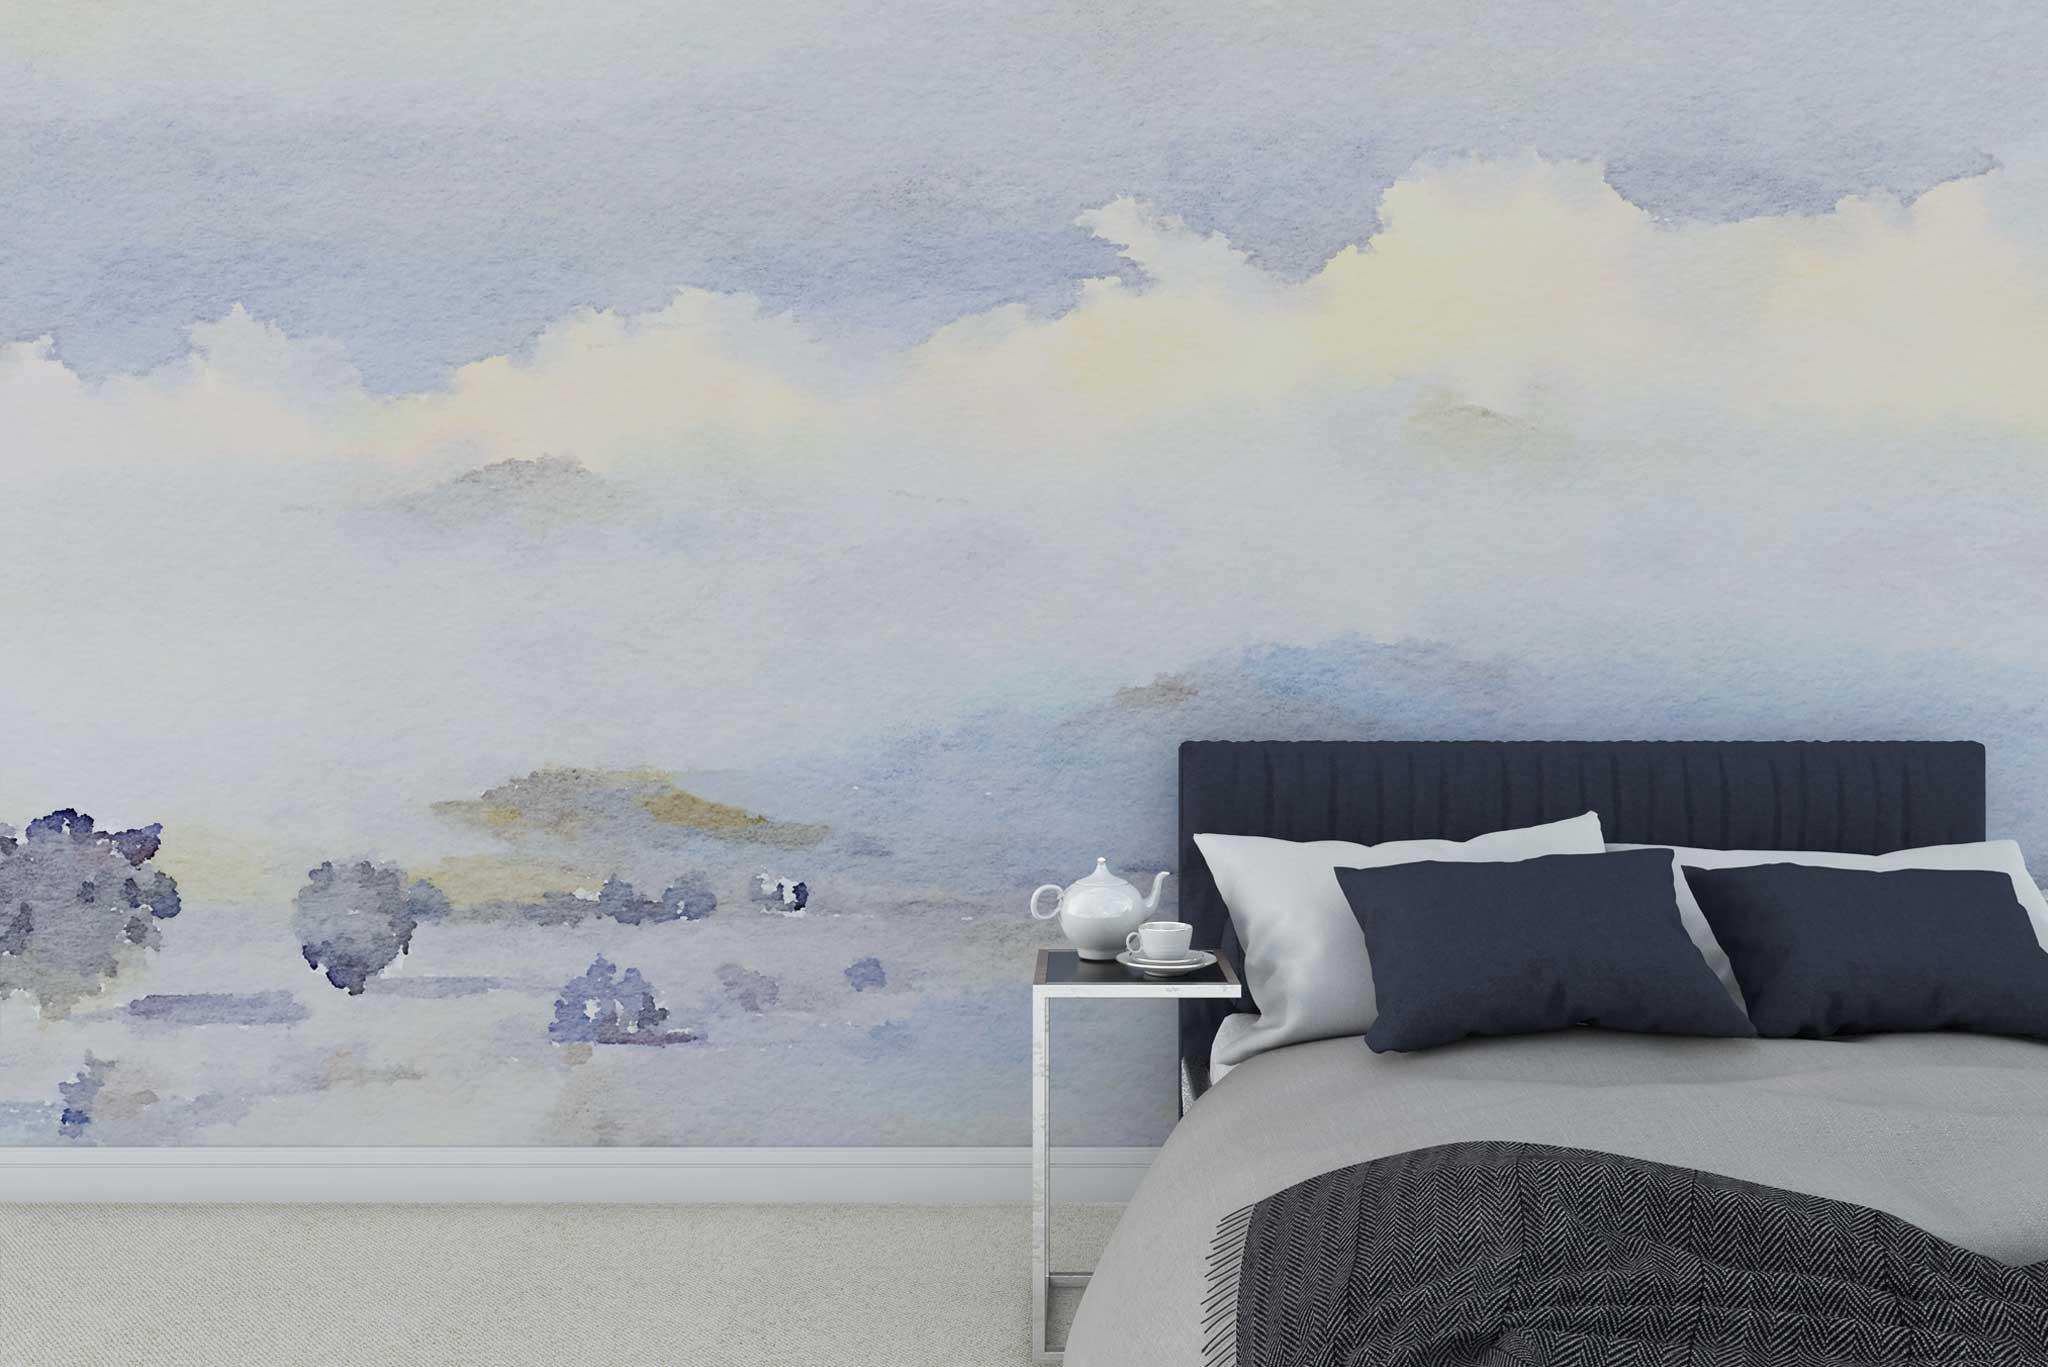 tapet-fototapet-special-personalizat-customizabil-comanda-bucuresti-daring-prints-model-desen-ilustratie-acuarela-peisaj-bleu-pastel